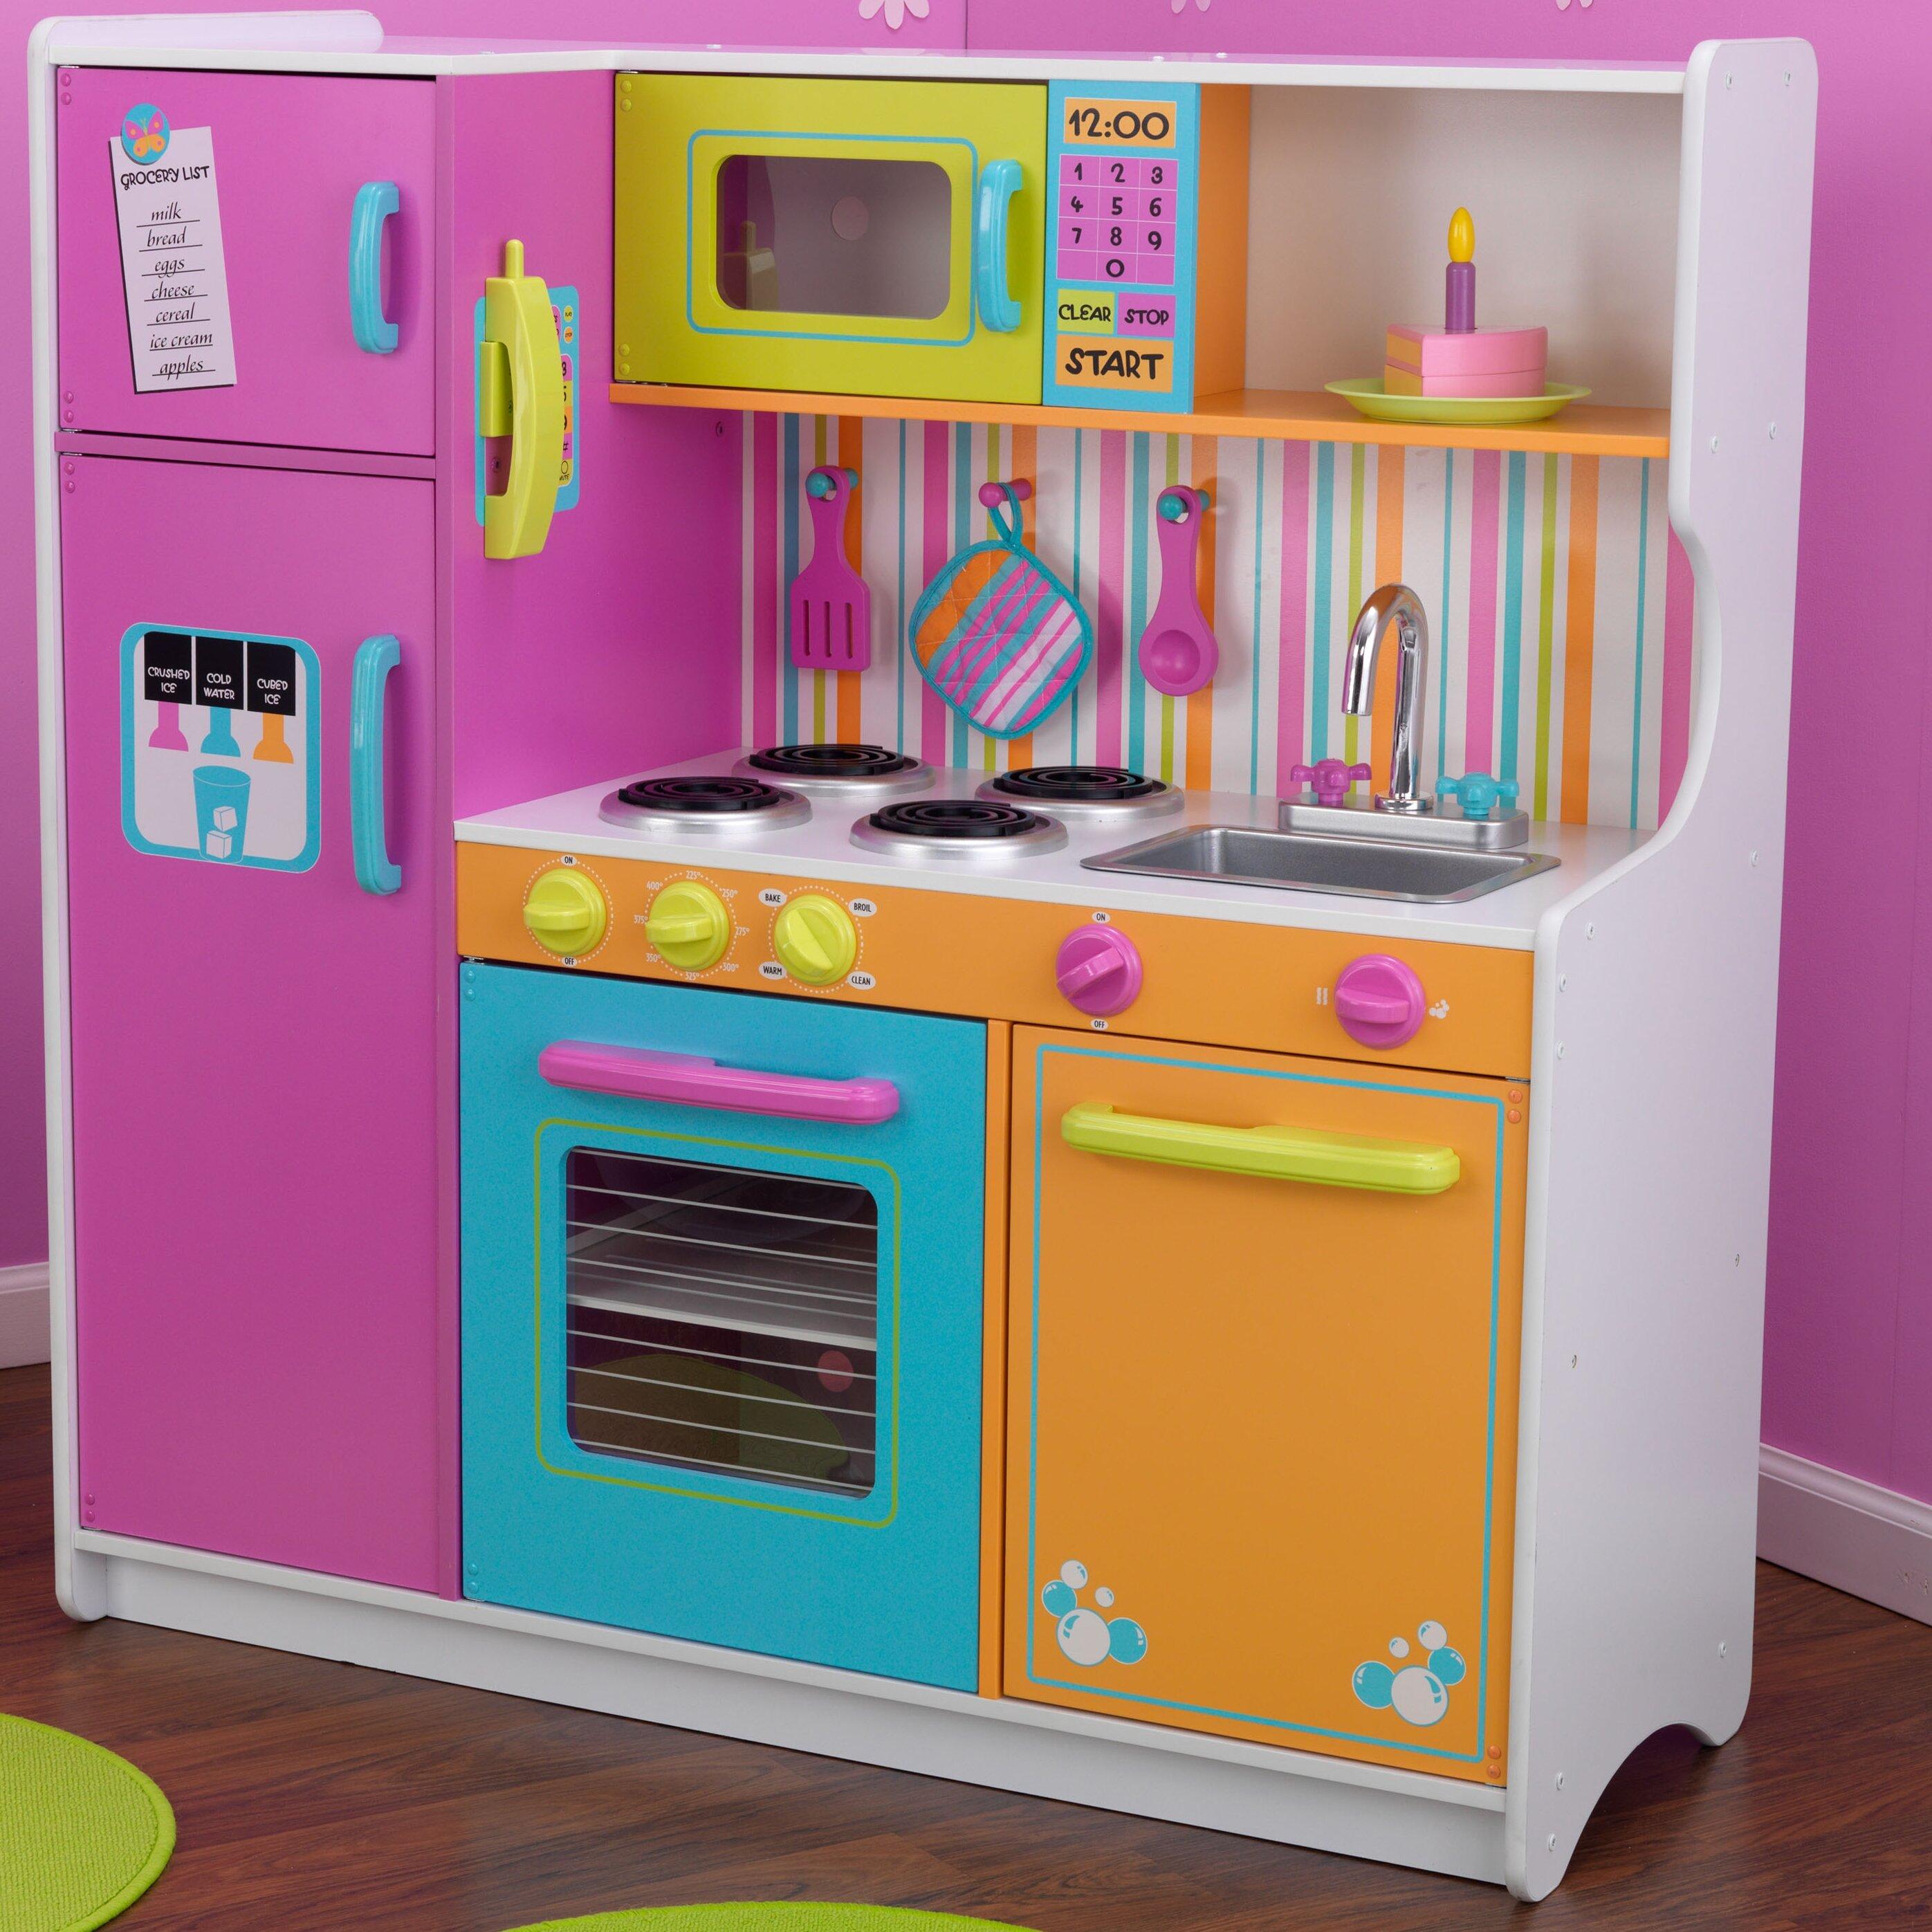 Genial Deluxe Big U0026 Bright Kitchen Set